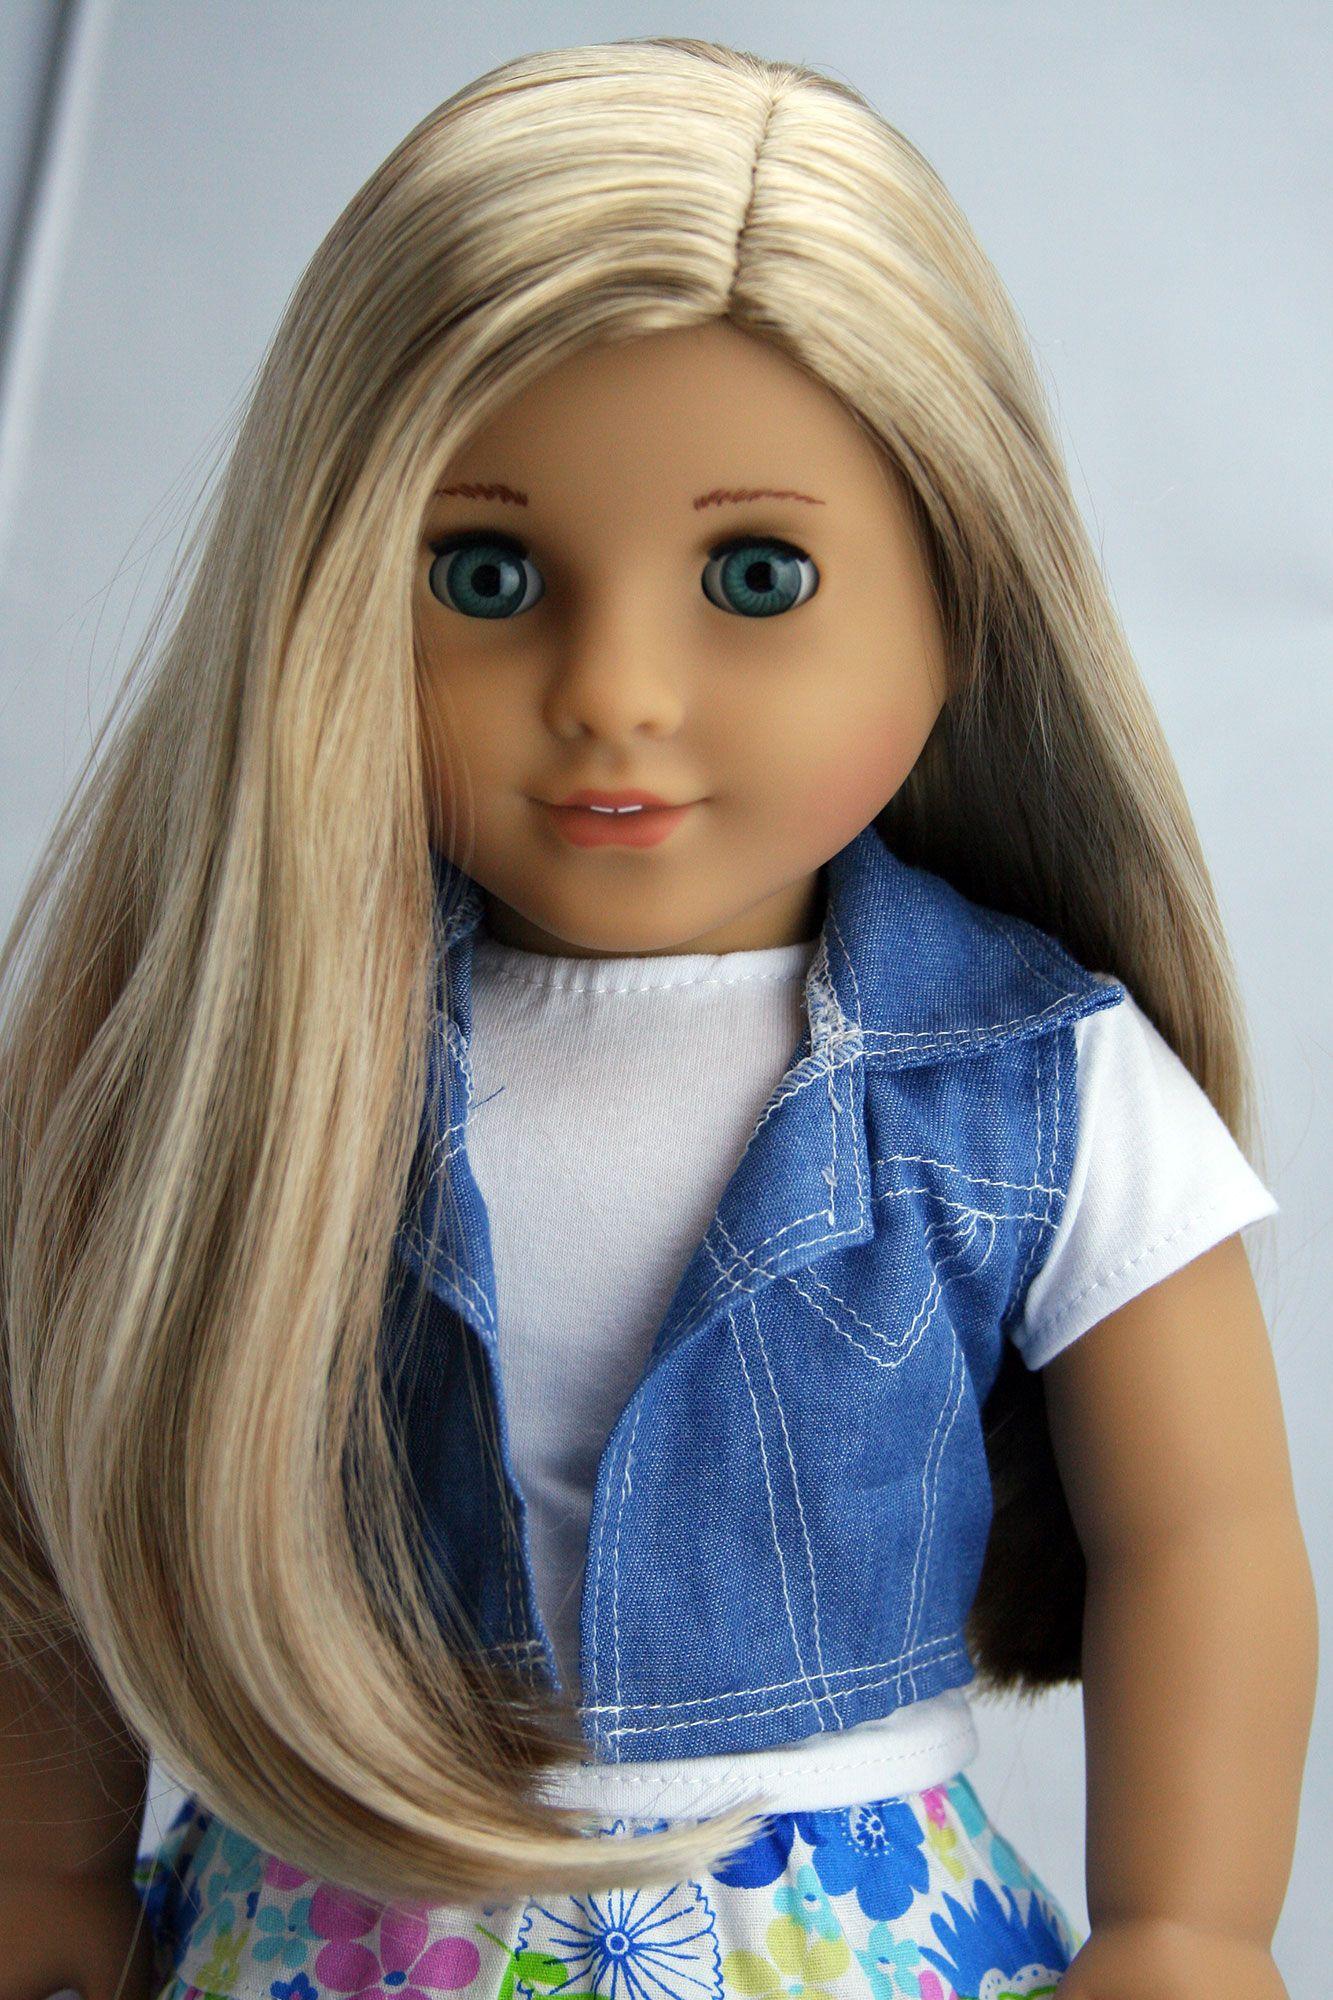 Custom american girl doll aqua blue eyes and blonde hair